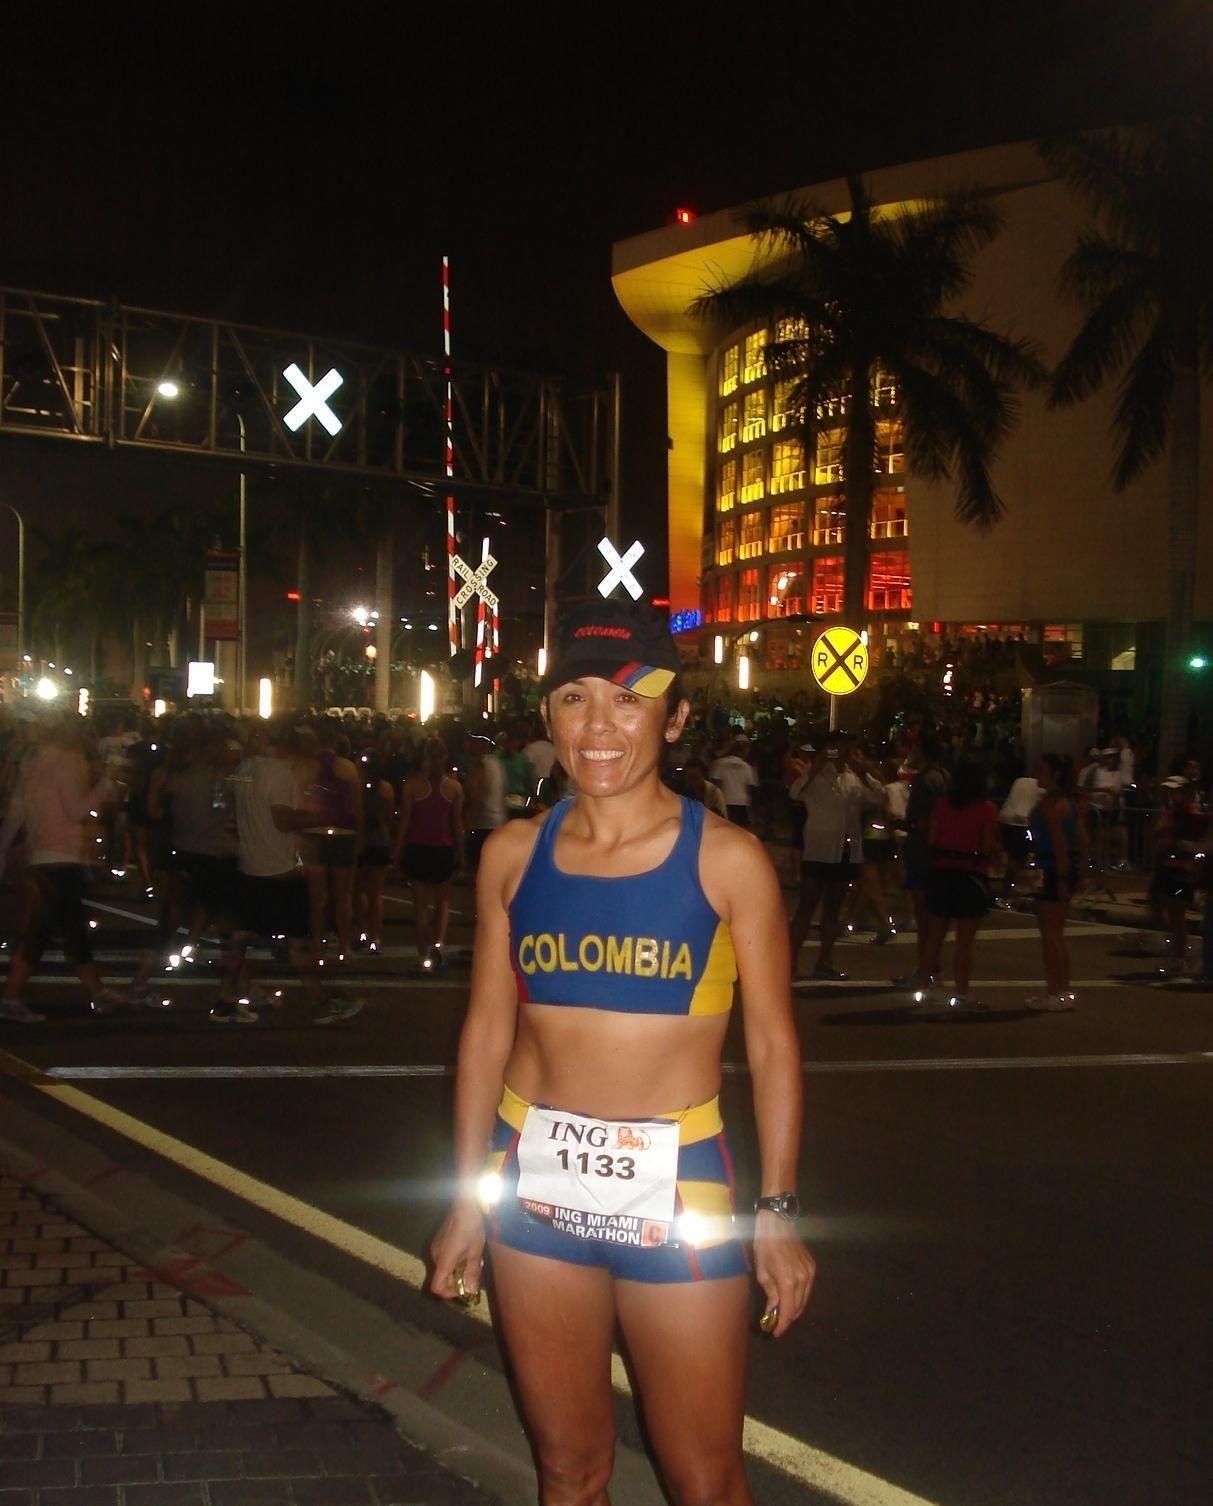 Run Club Miami Member of Run Club